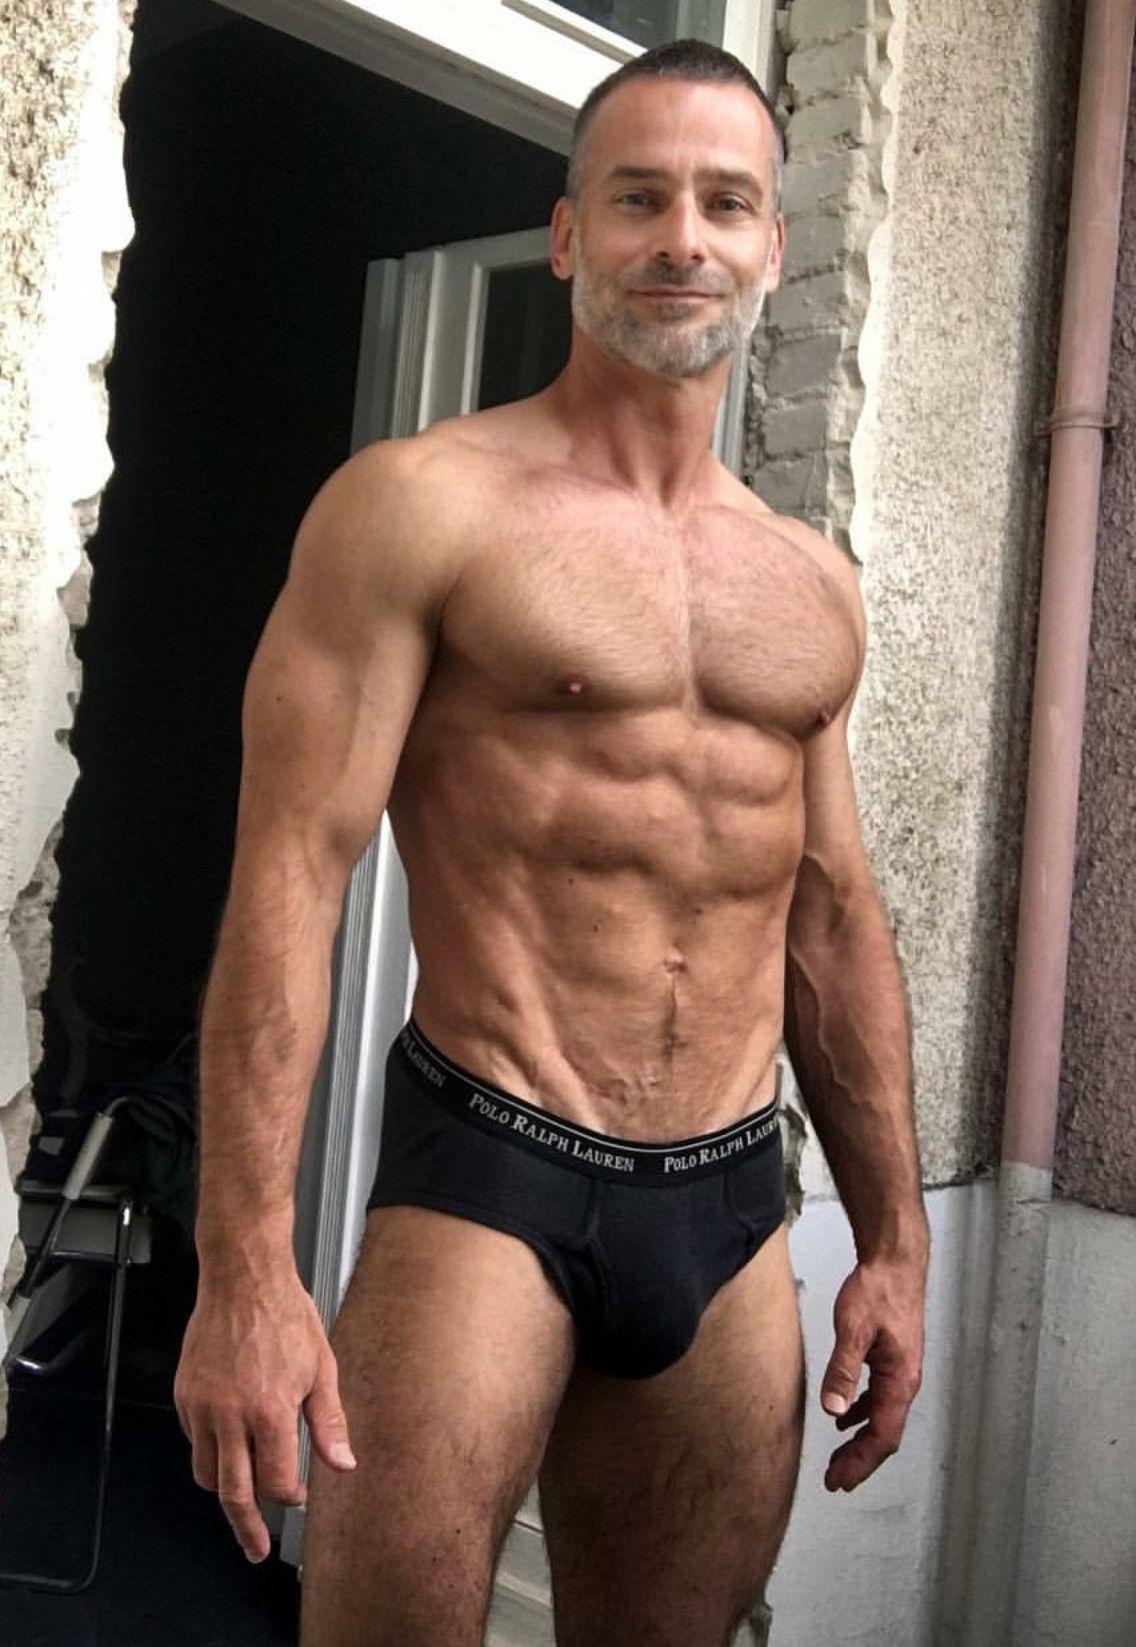 Hombres de músculo caliente casi desnudo